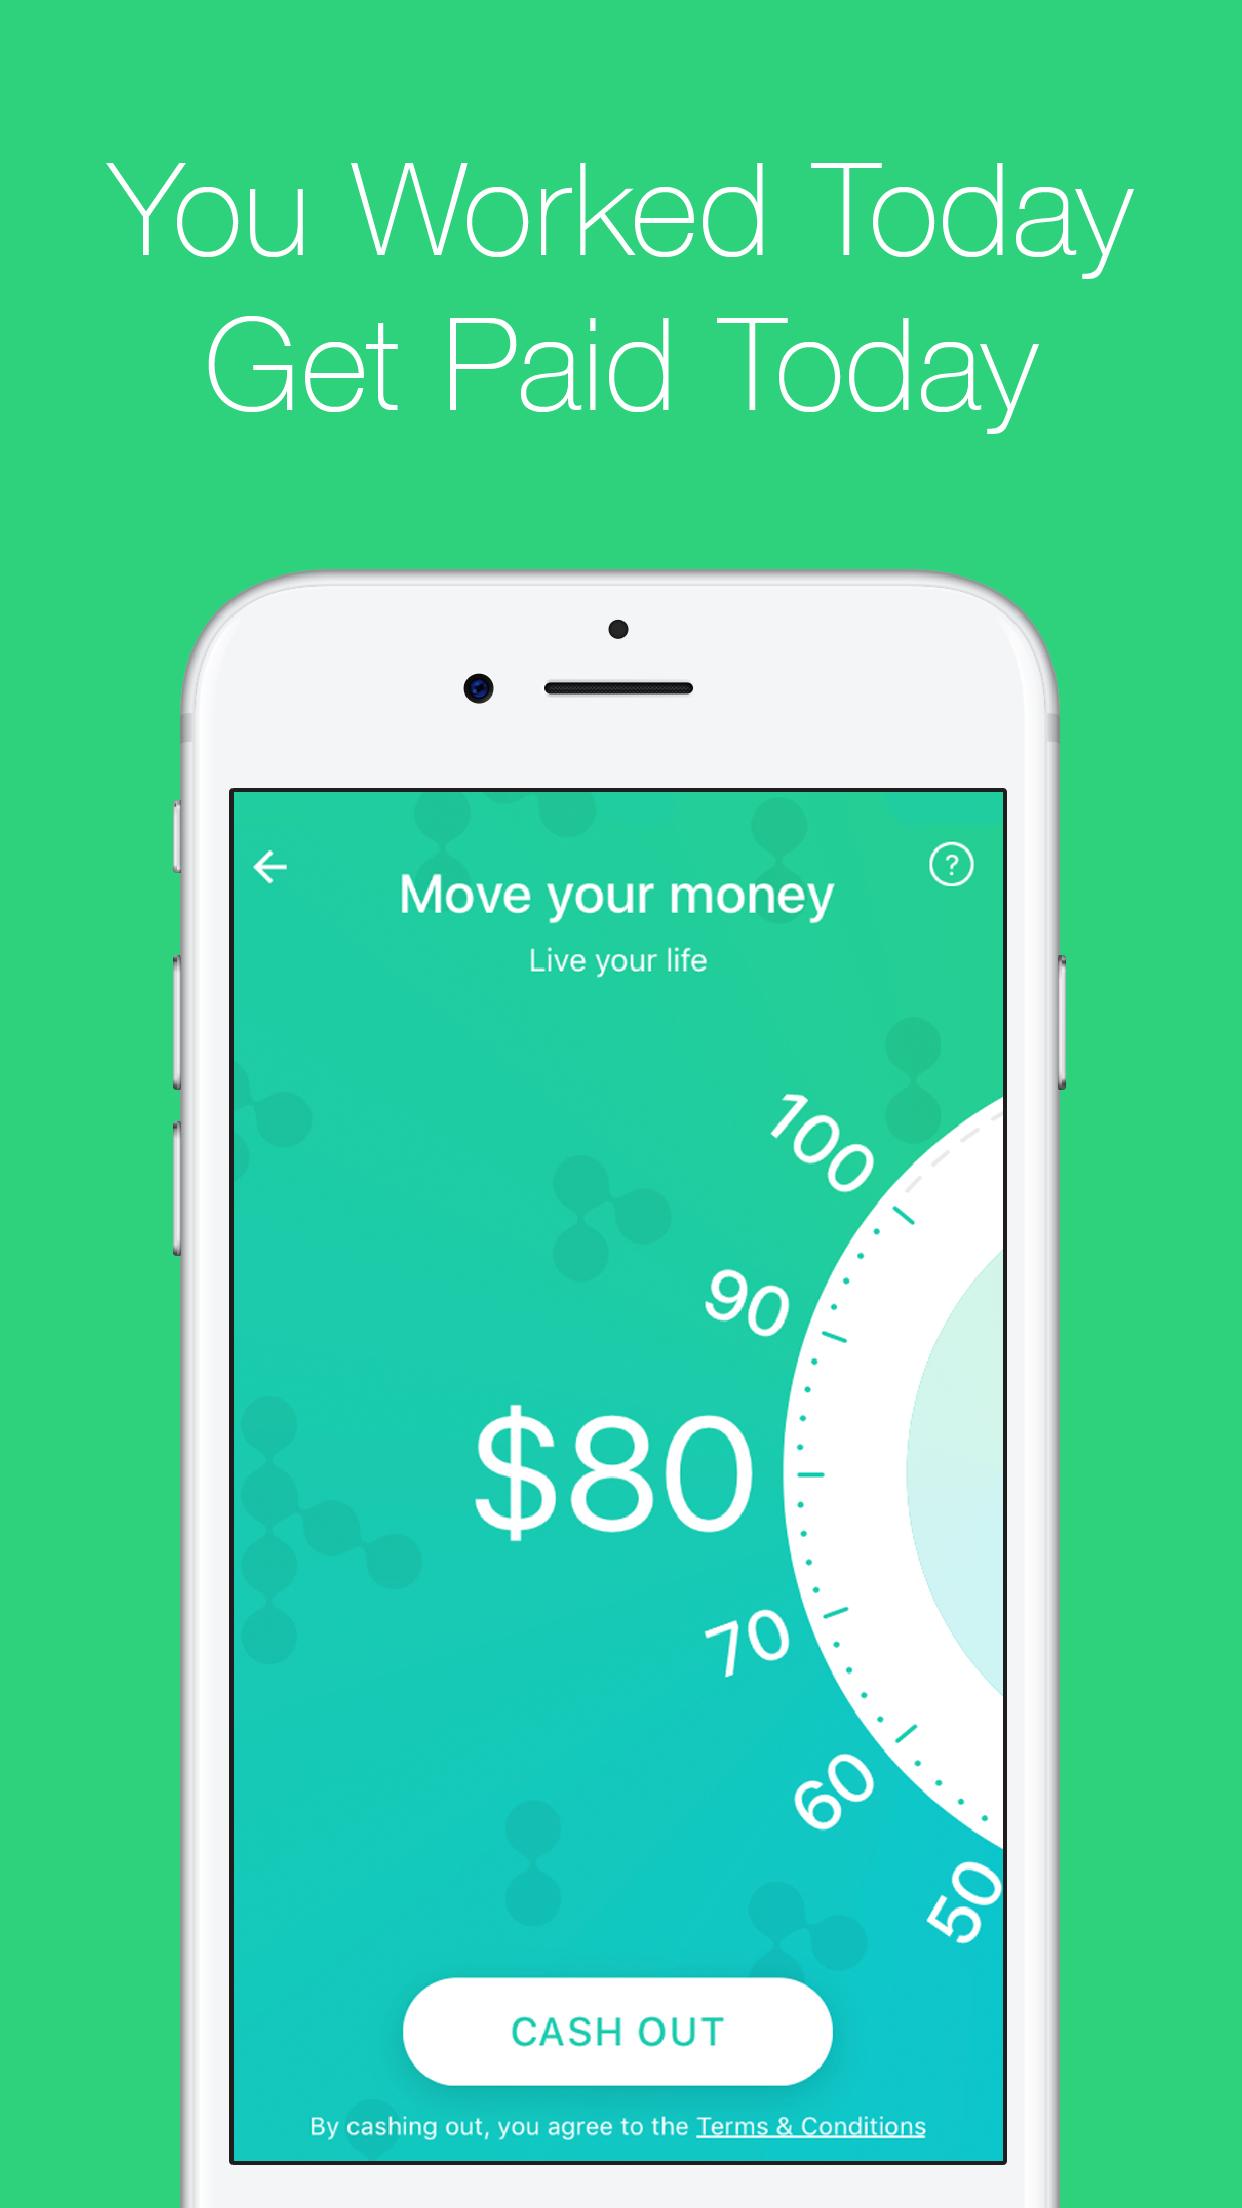 Earnin - Get Paid Today Screenshot